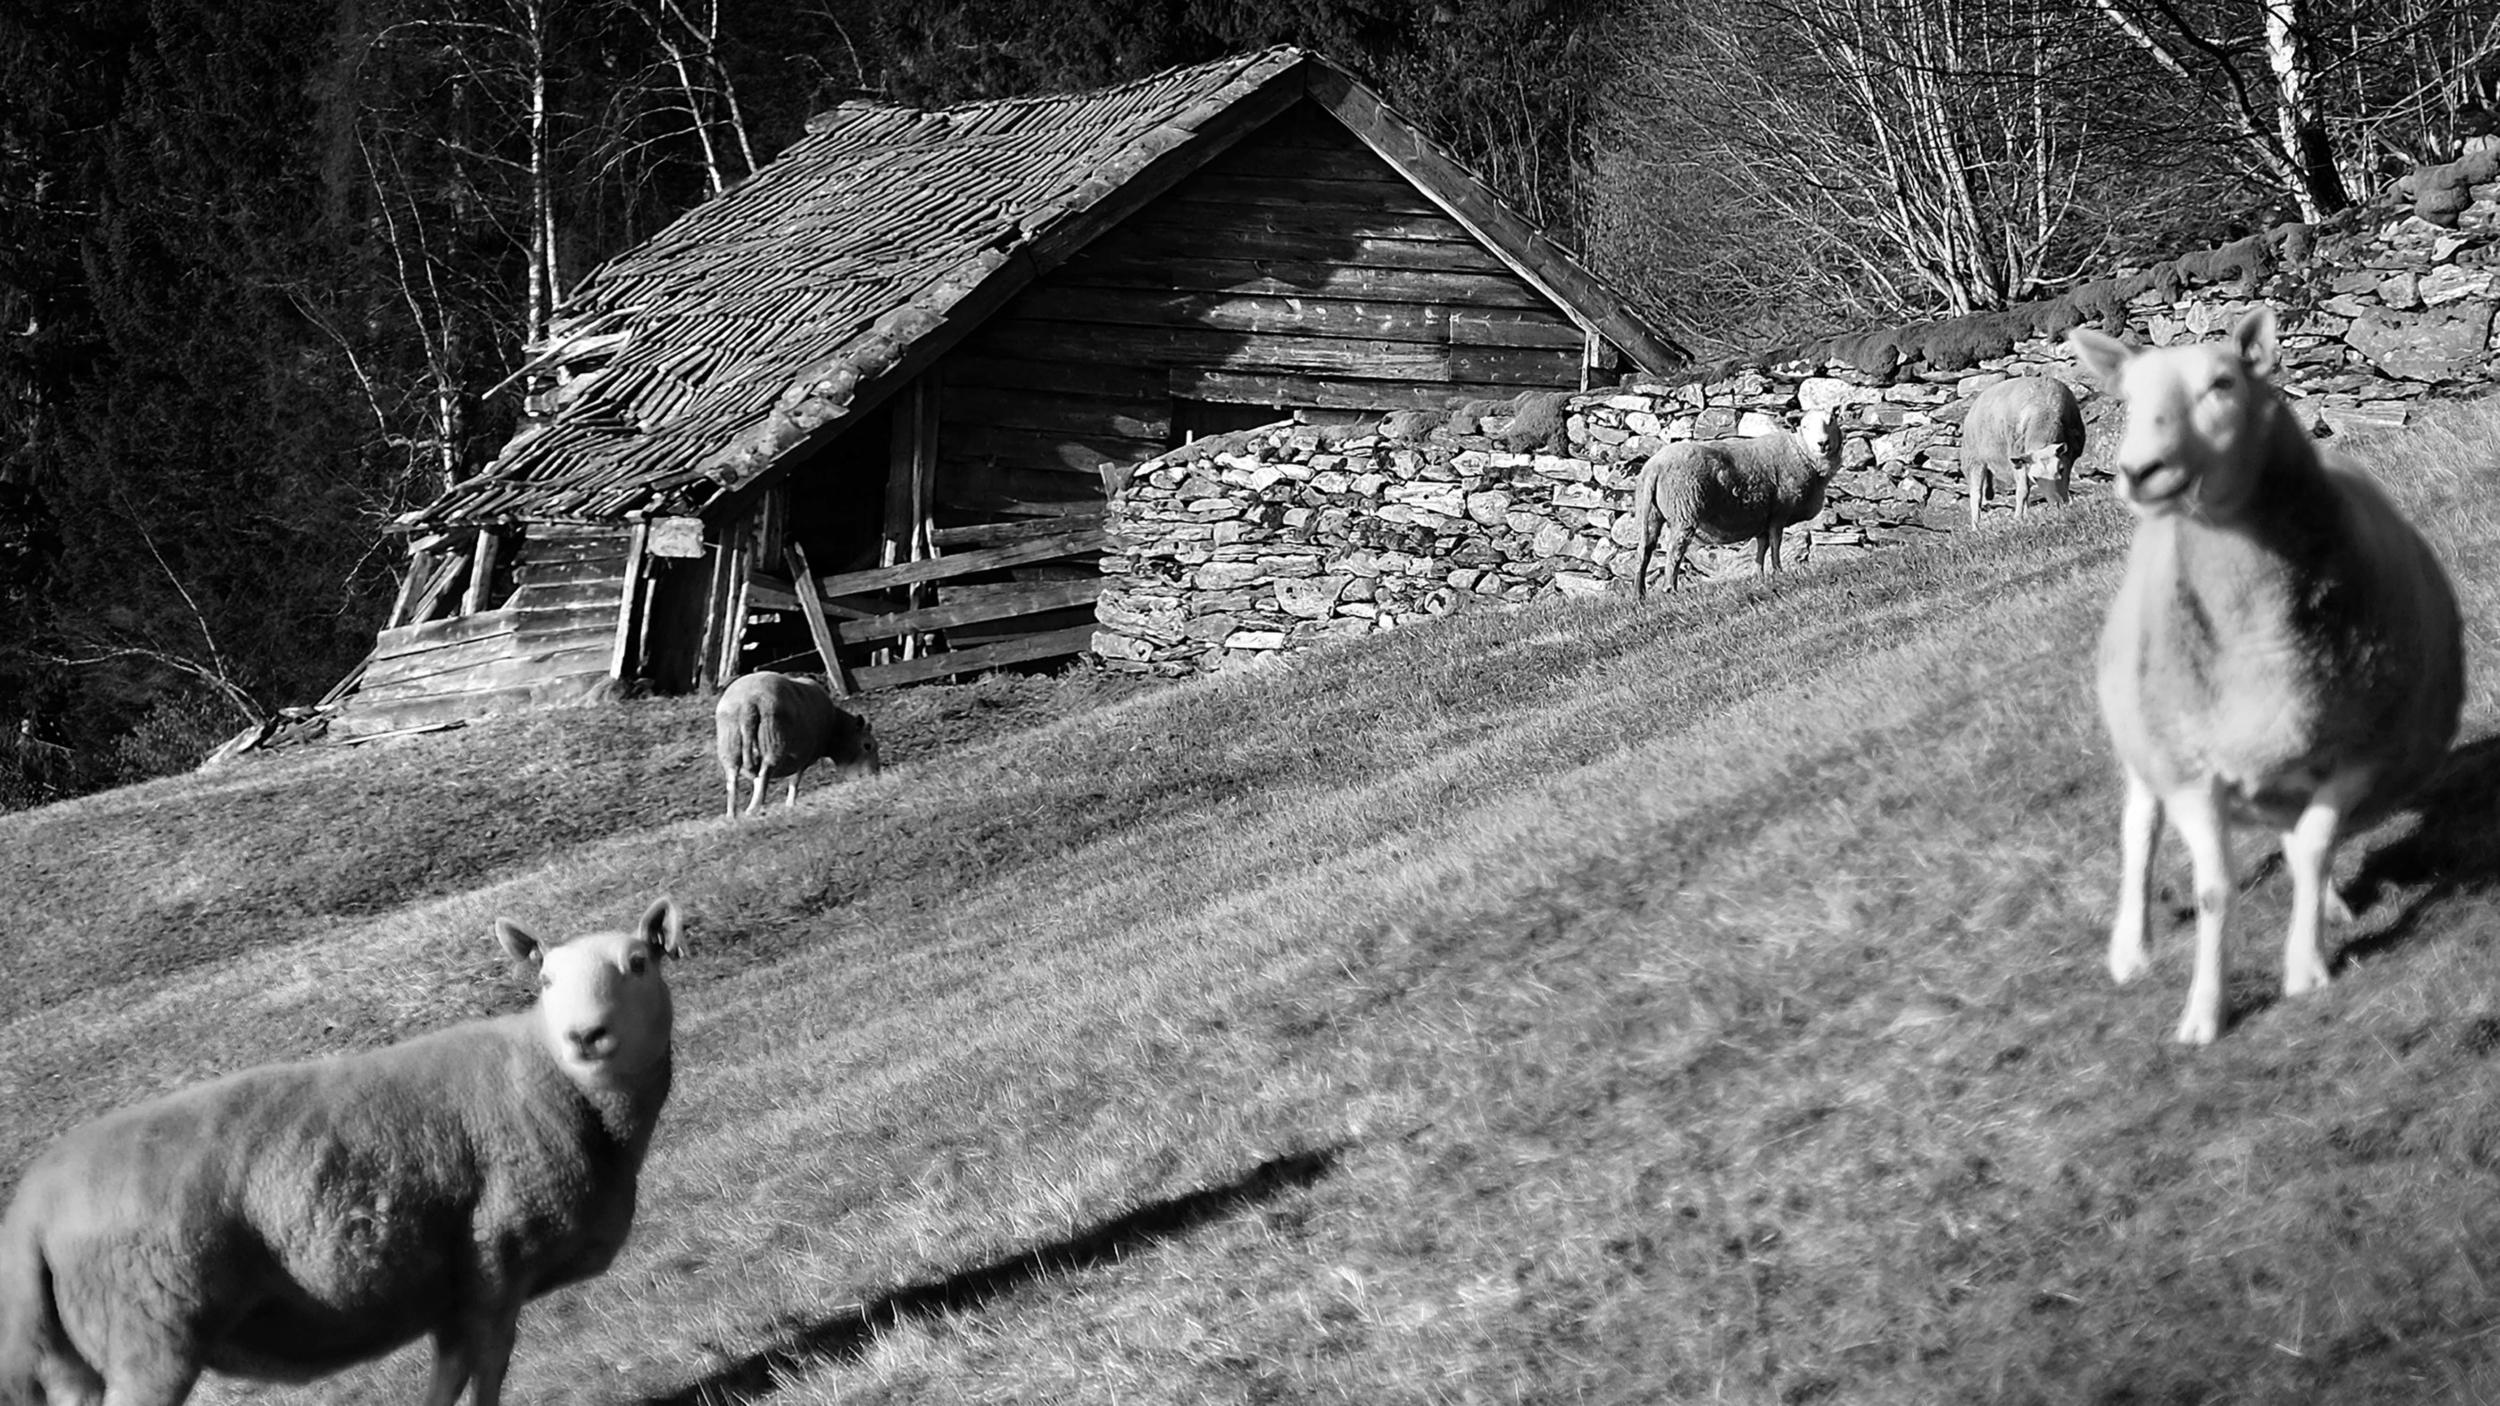 Fotografi: Øystein Forheim, Freqency.no